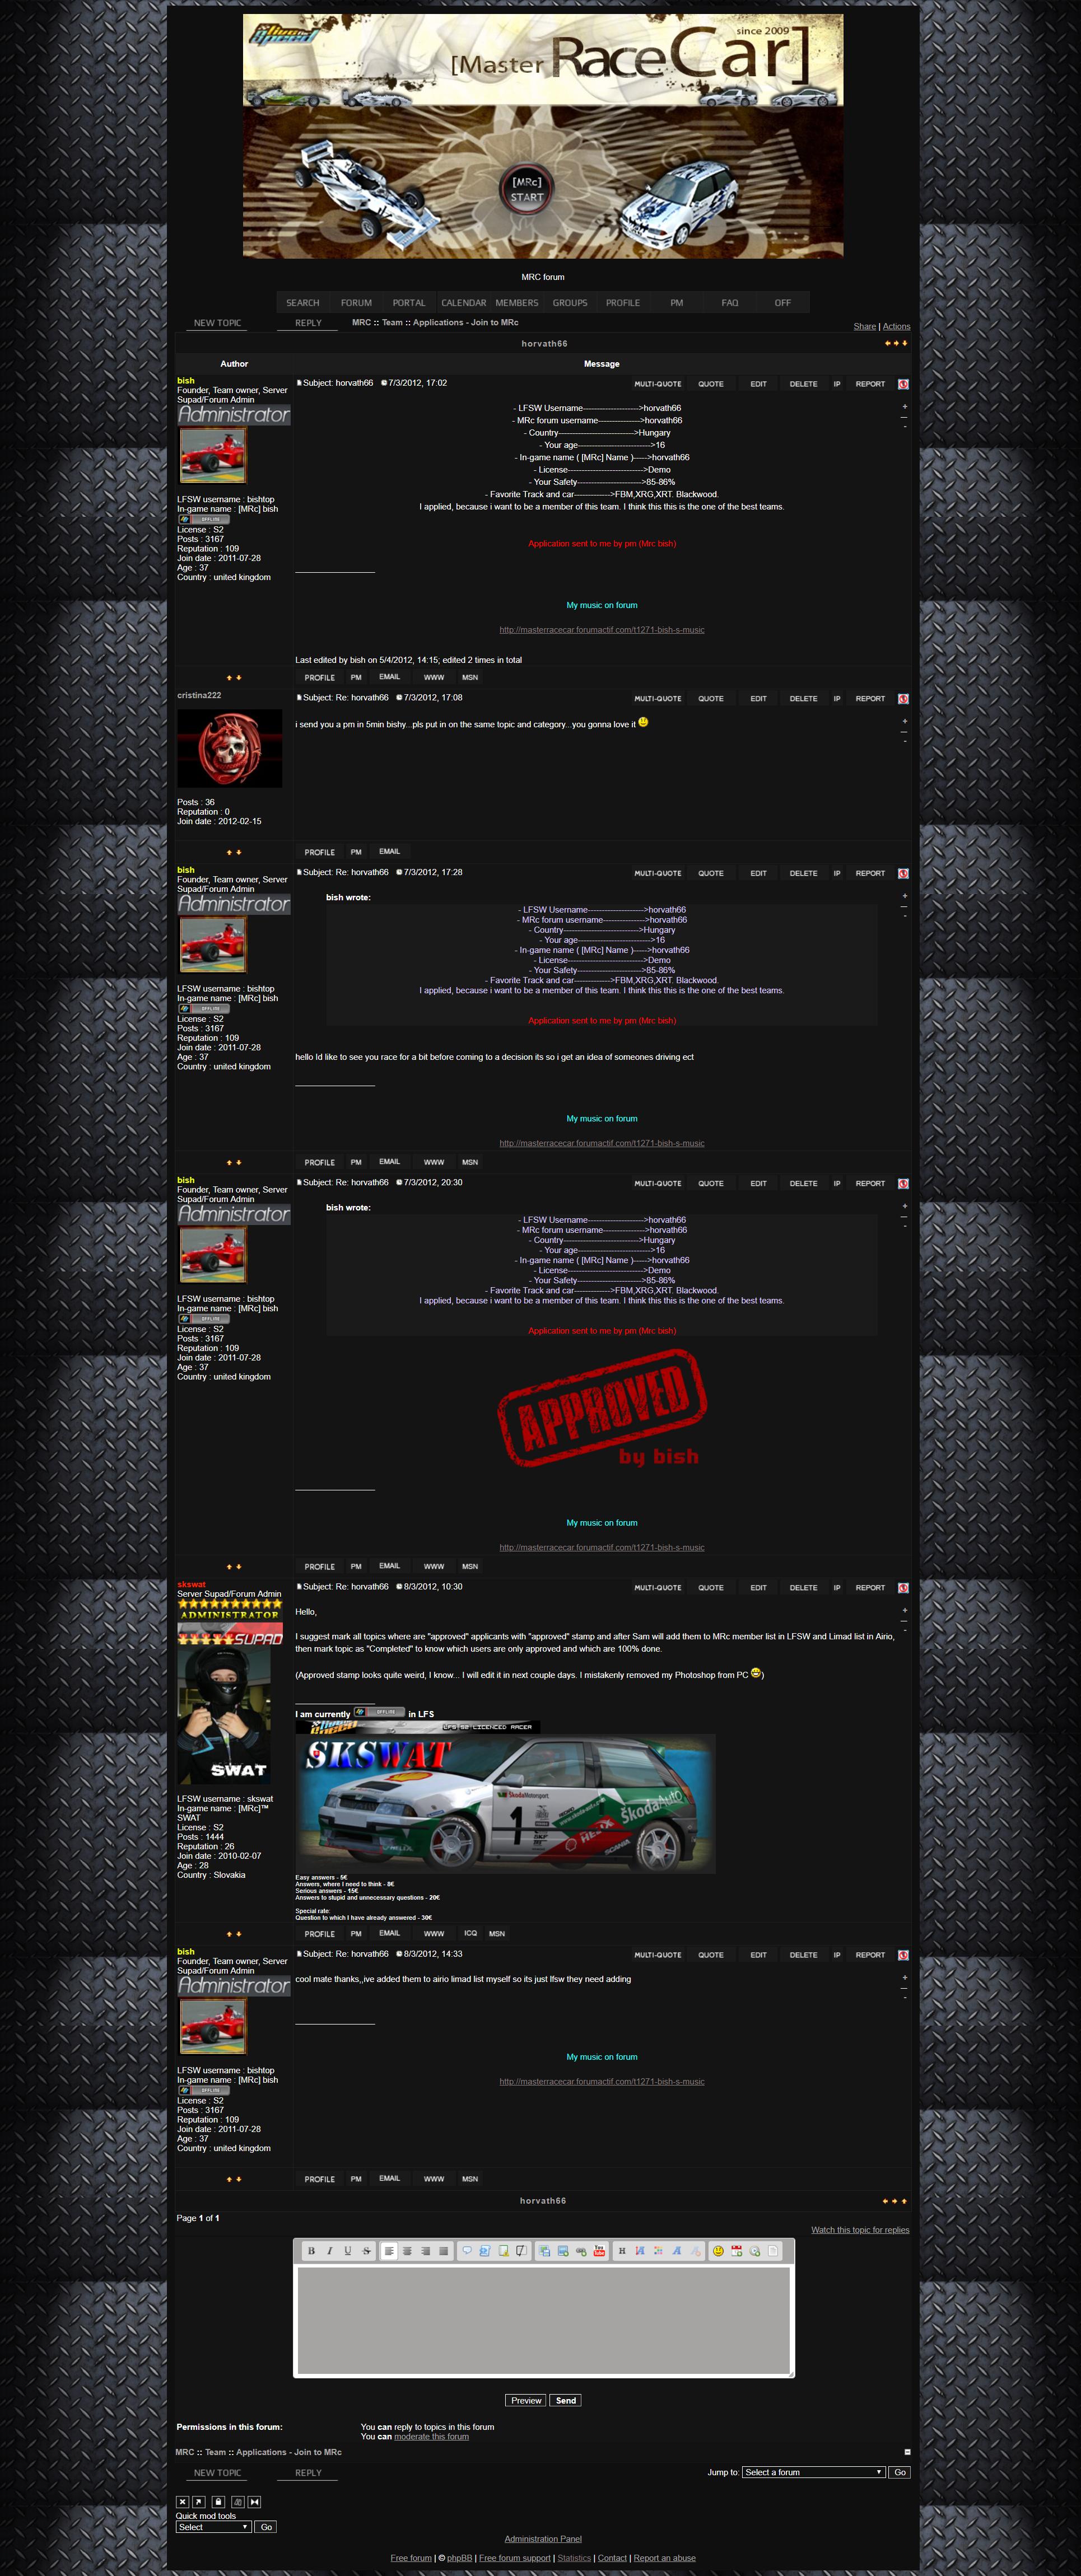 [Image: screencapture-masterracecar-forumactif-t...-24-14.jpg]